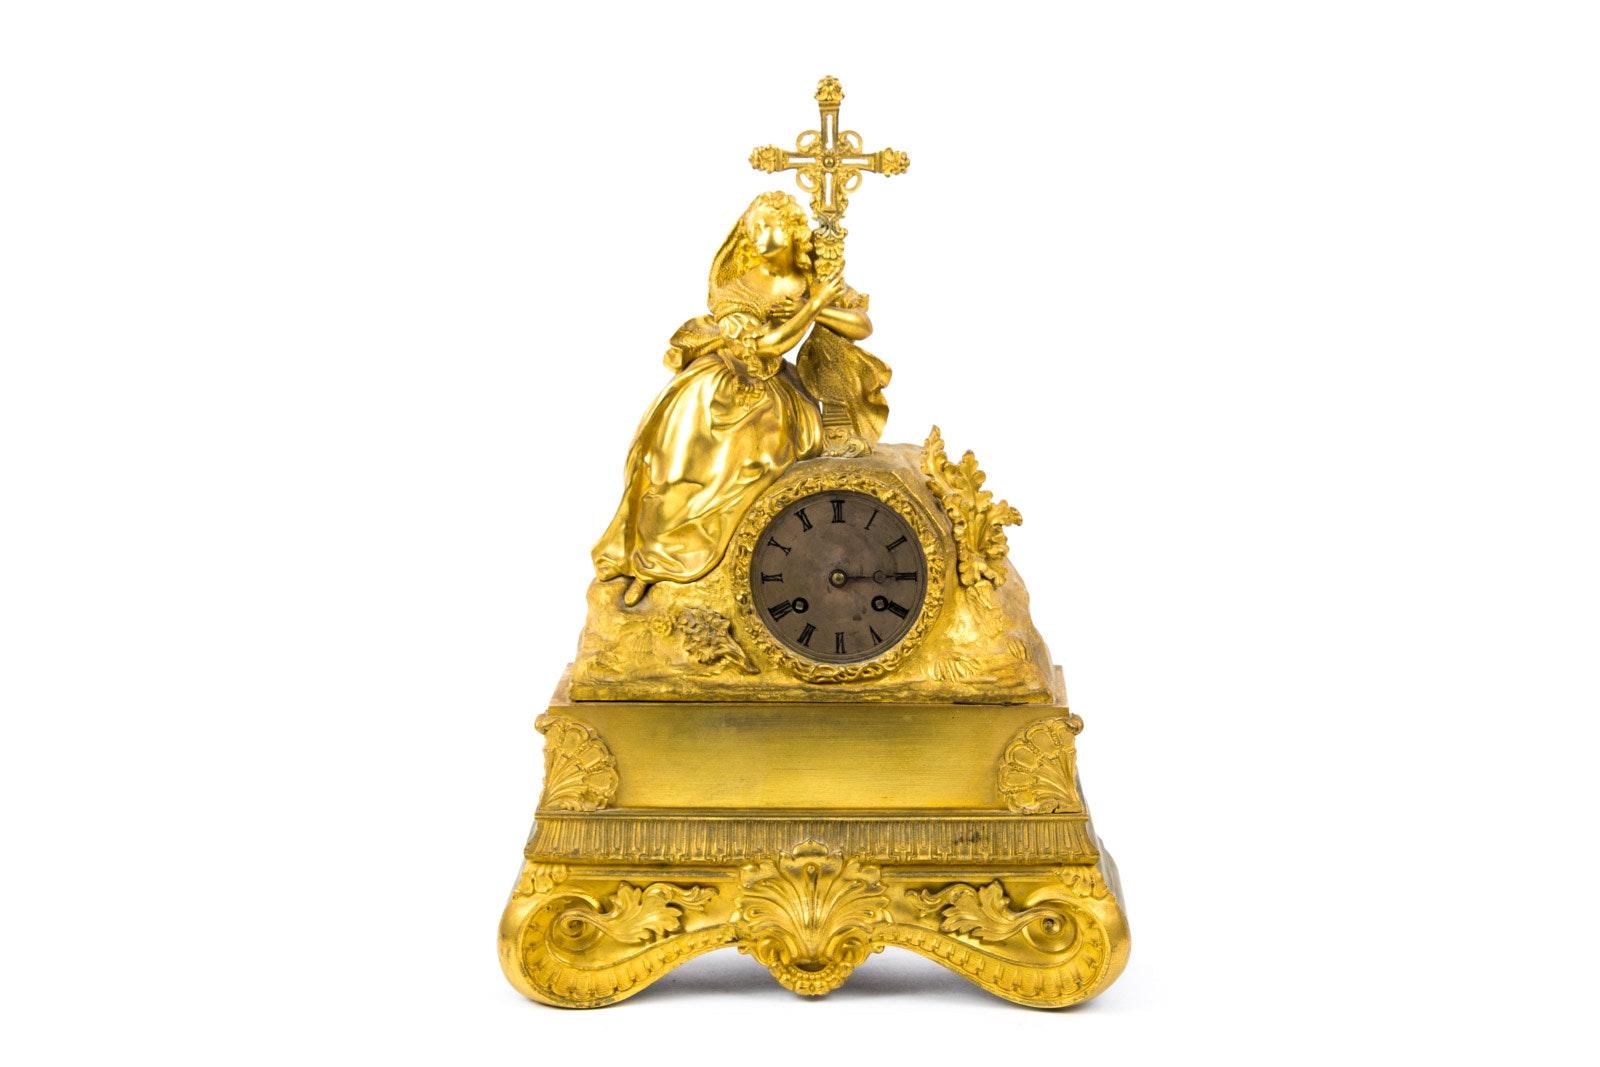 Antique to Vintage Brass Tone Metal Figural Mantel Clock